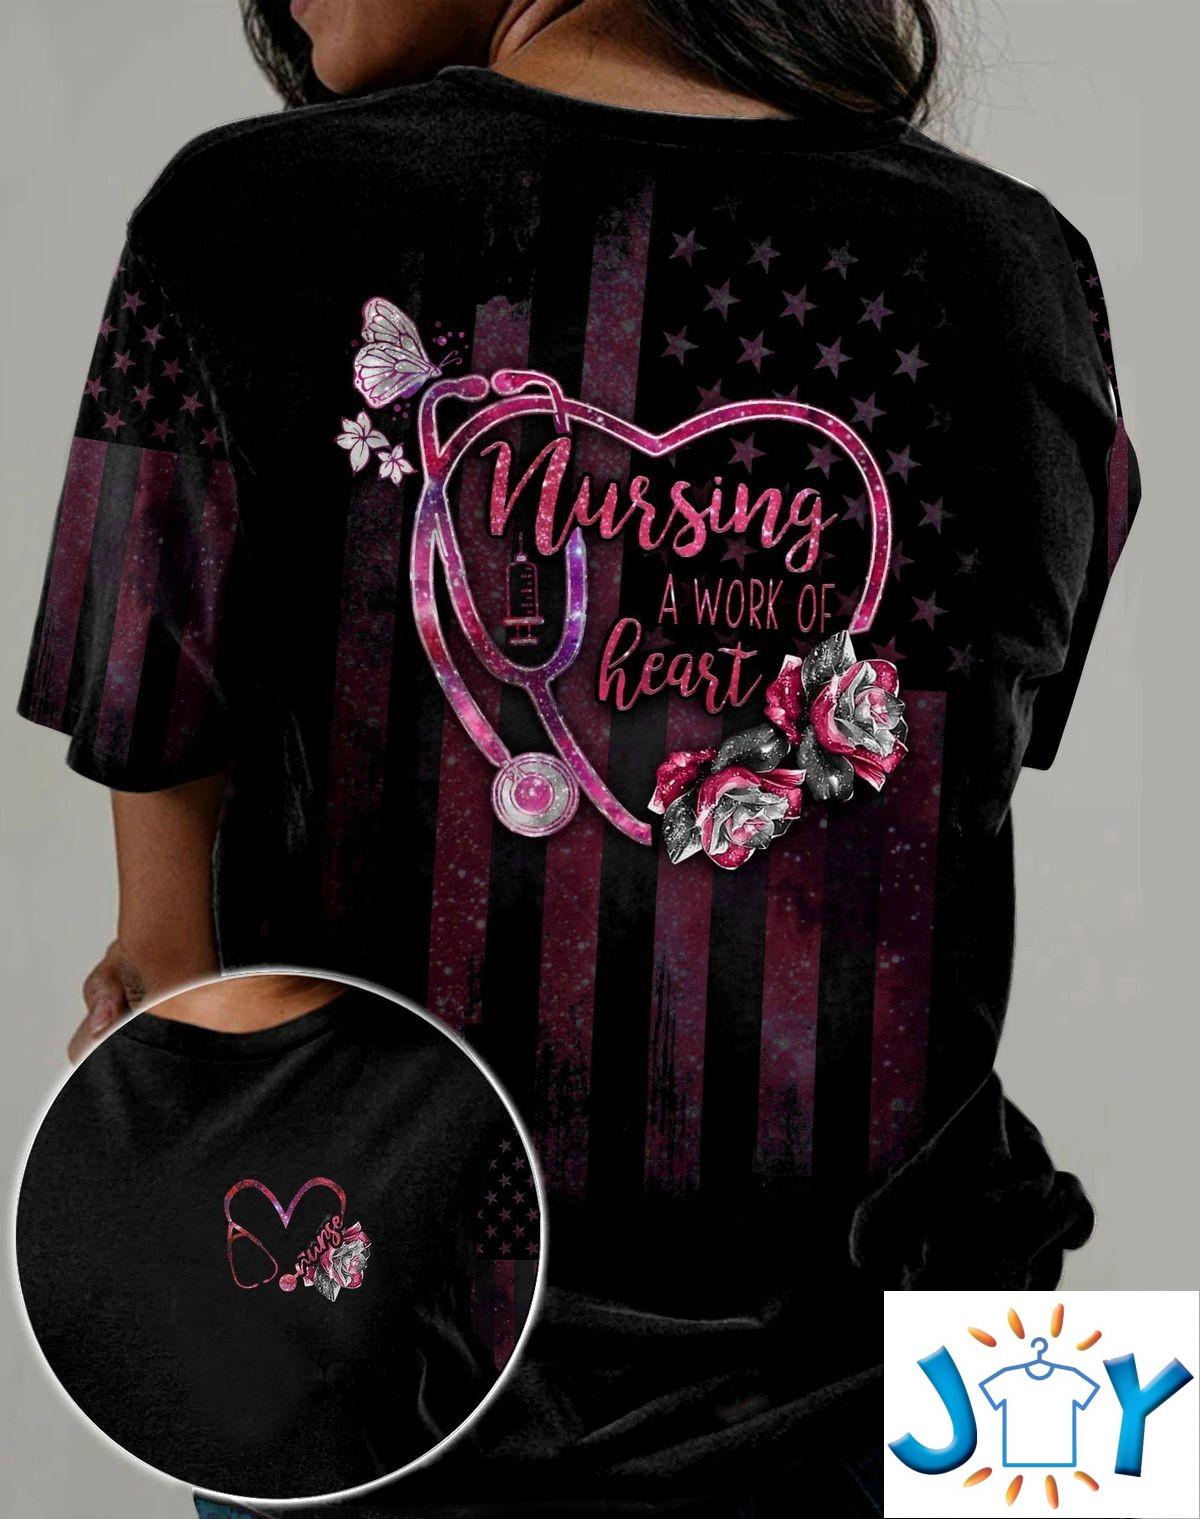 Nurse Life Nursing Is A Work Of Heart 3D All Over Print T-shirt, Hoodie